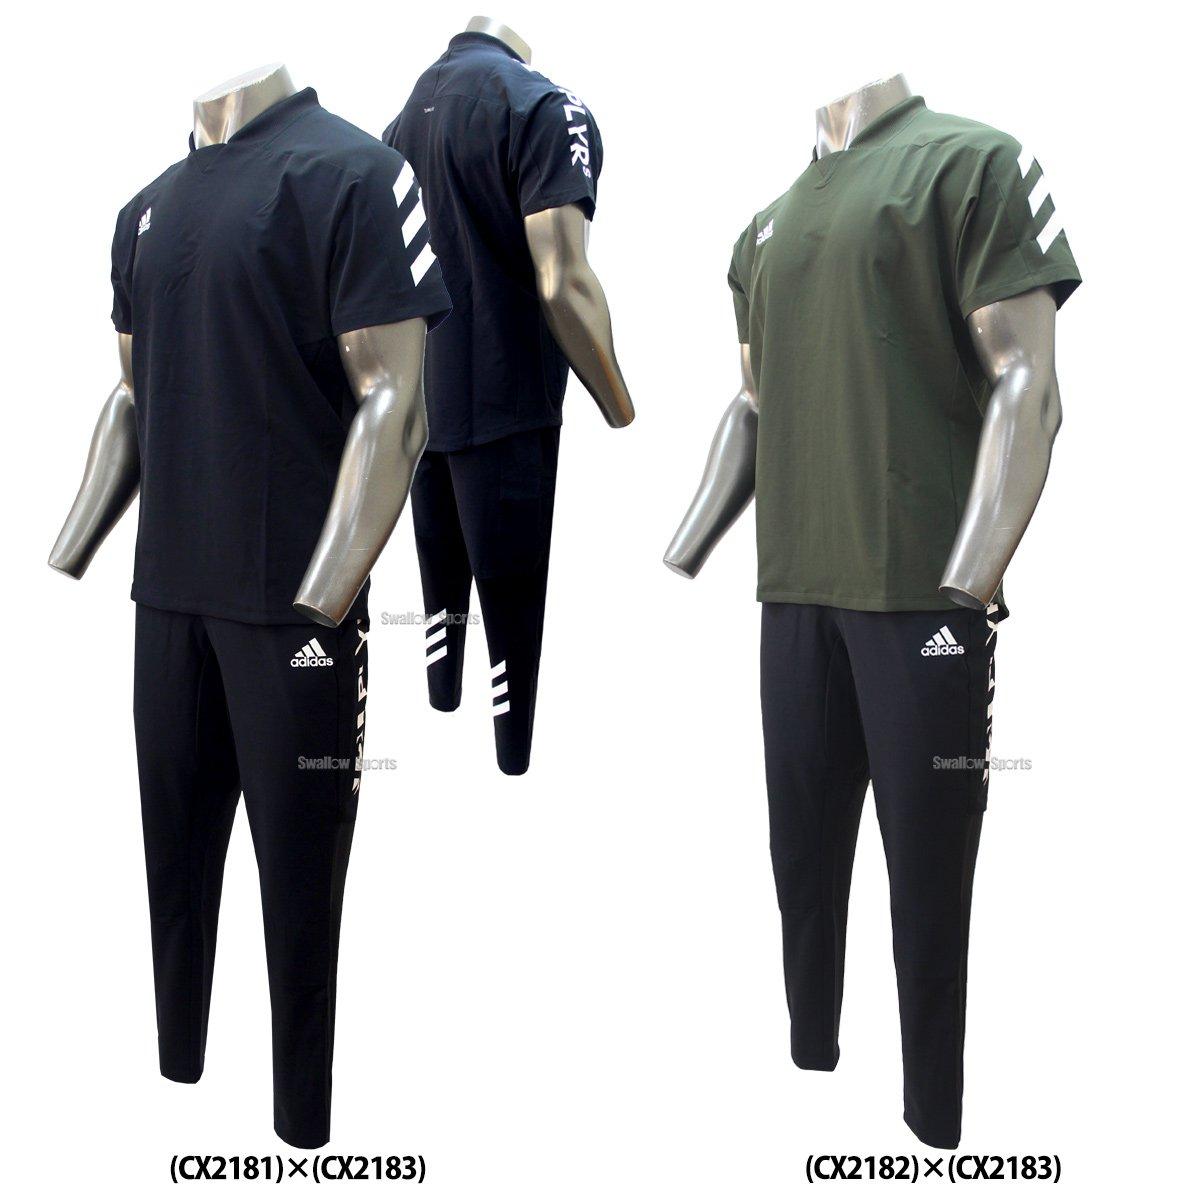 adidas アディダス ウェア 5T ハイブリッド 半袖 ジャケット パンツ 上下セット セットアップ ETX99-ETY02 B079Y6S717 J/O|(CX2182)×(CX2183) (CX2182)×(CX2183) J/O